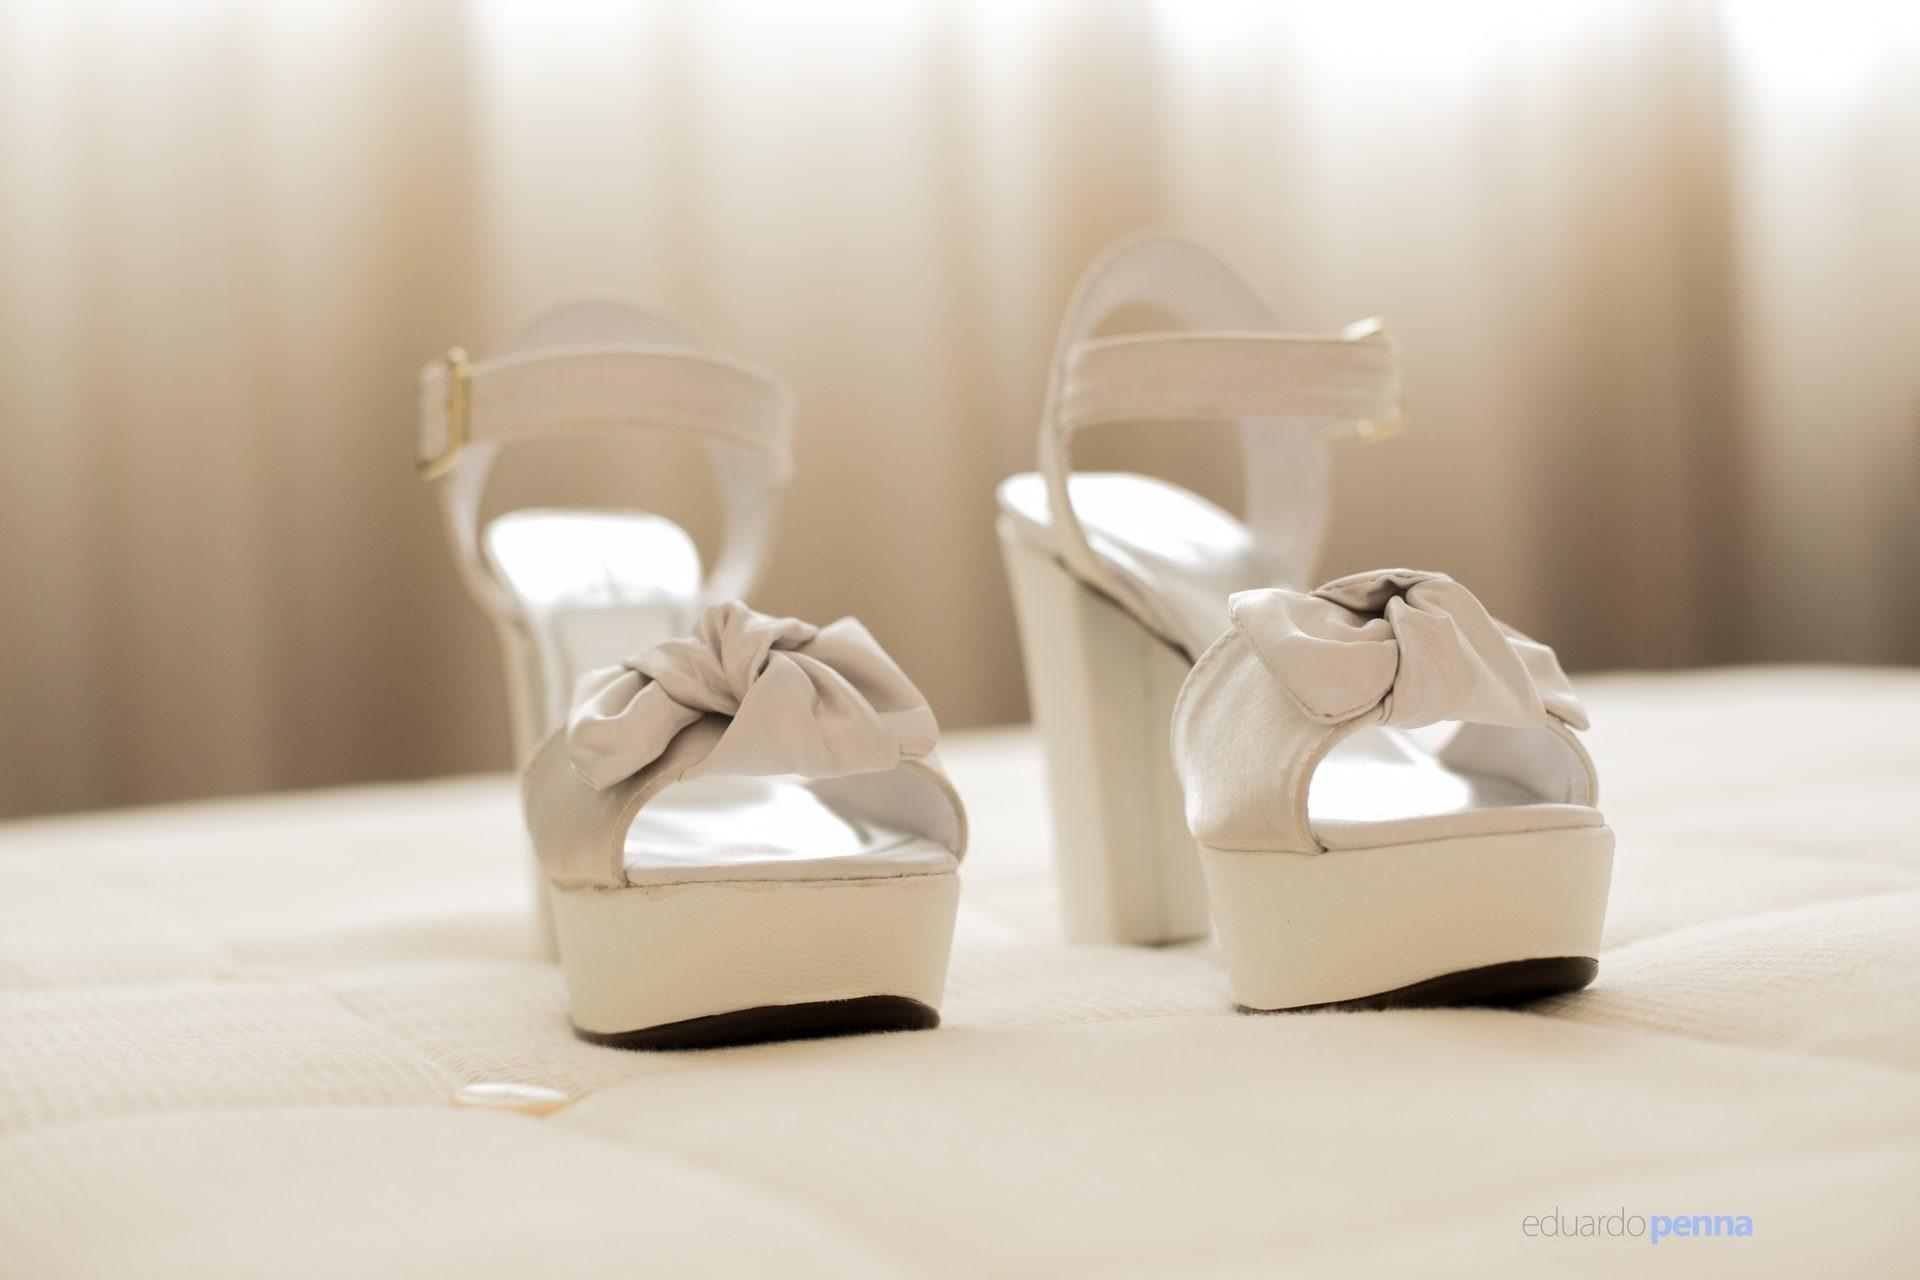 foto do sapato da noiva antes do casamento